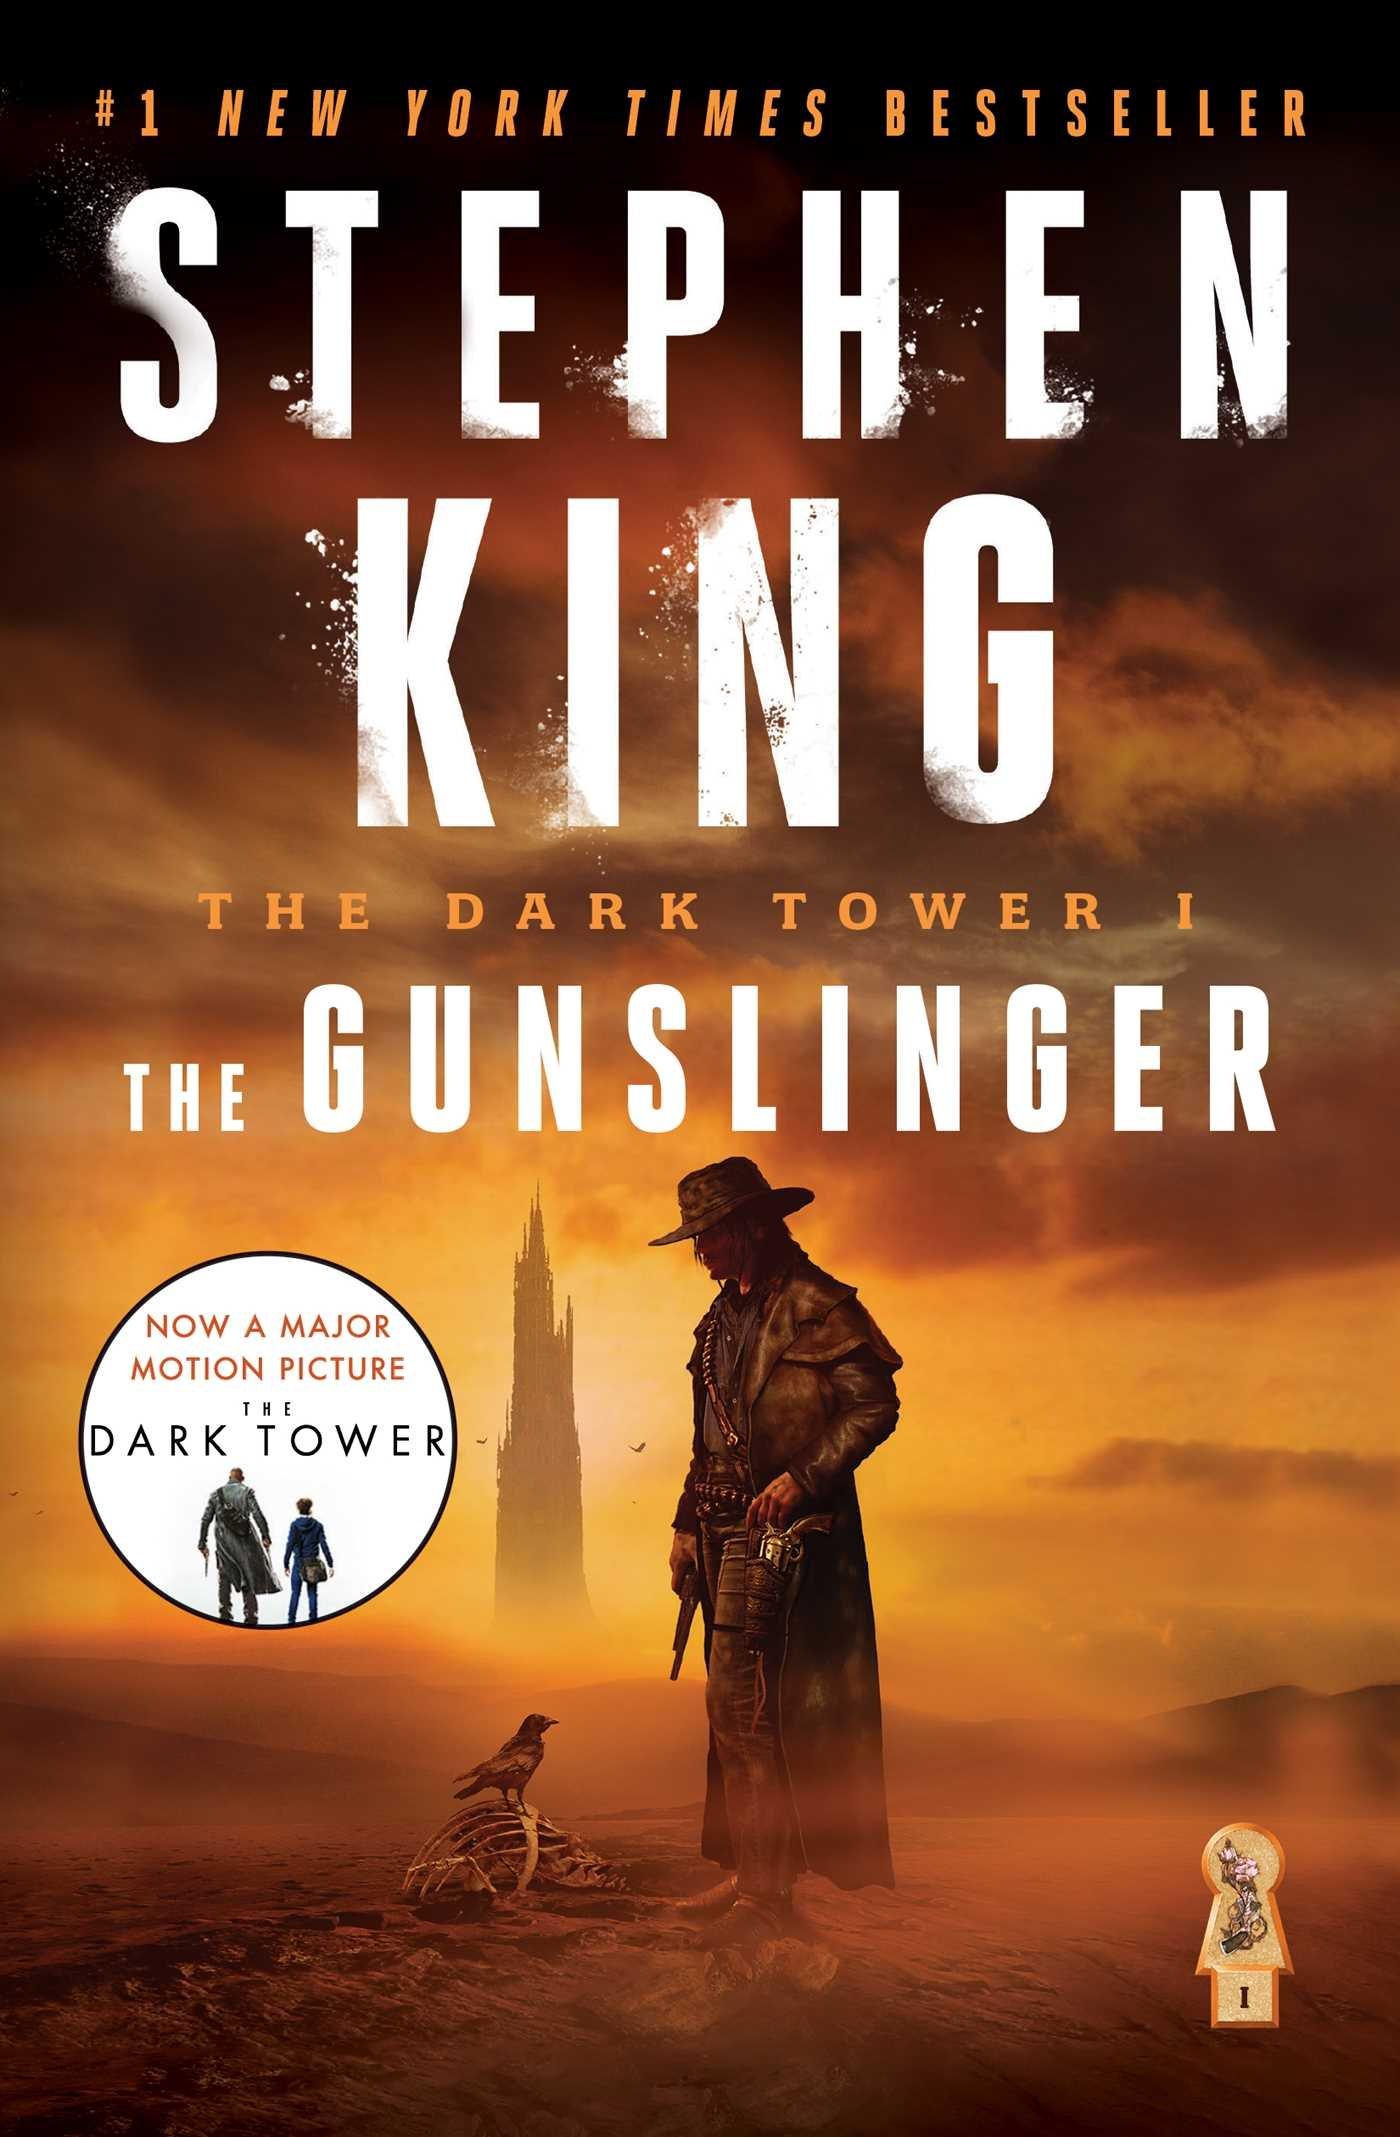 Dark Tower I Gunslinger product image